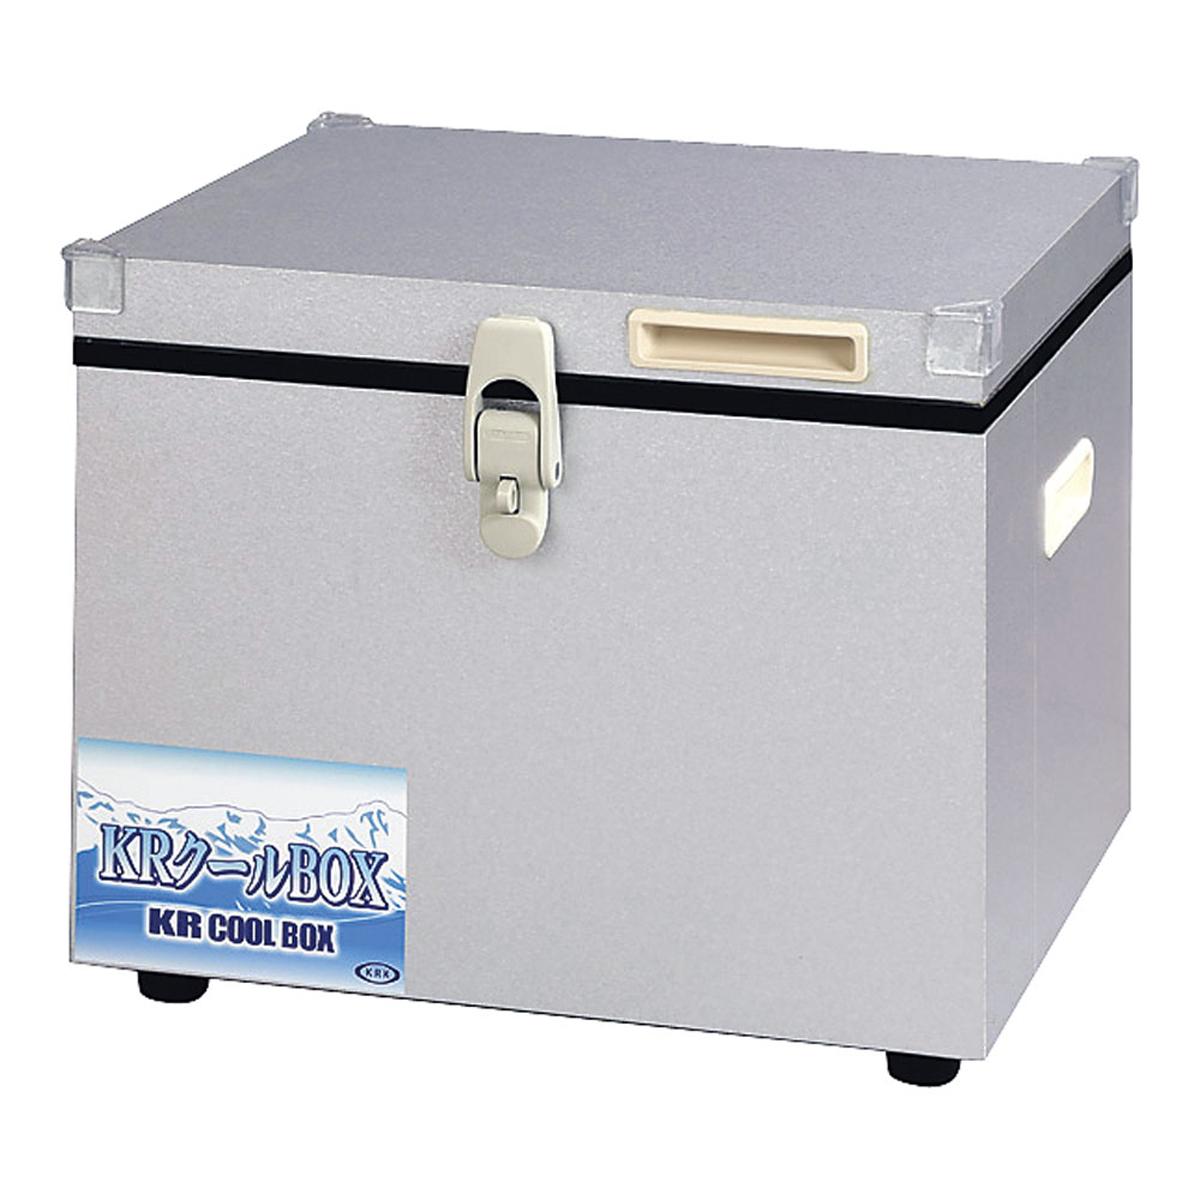 KRクールBOX-S(新タイプ) KRCL-20L 標準タイプ [運賃別途お見積り] [メーカー直送 代引き不可] 6-0164-0901【厨房用品 料理道具 バット 番重 コンテナ 業務用 販売 通販】[10P03Dec16]